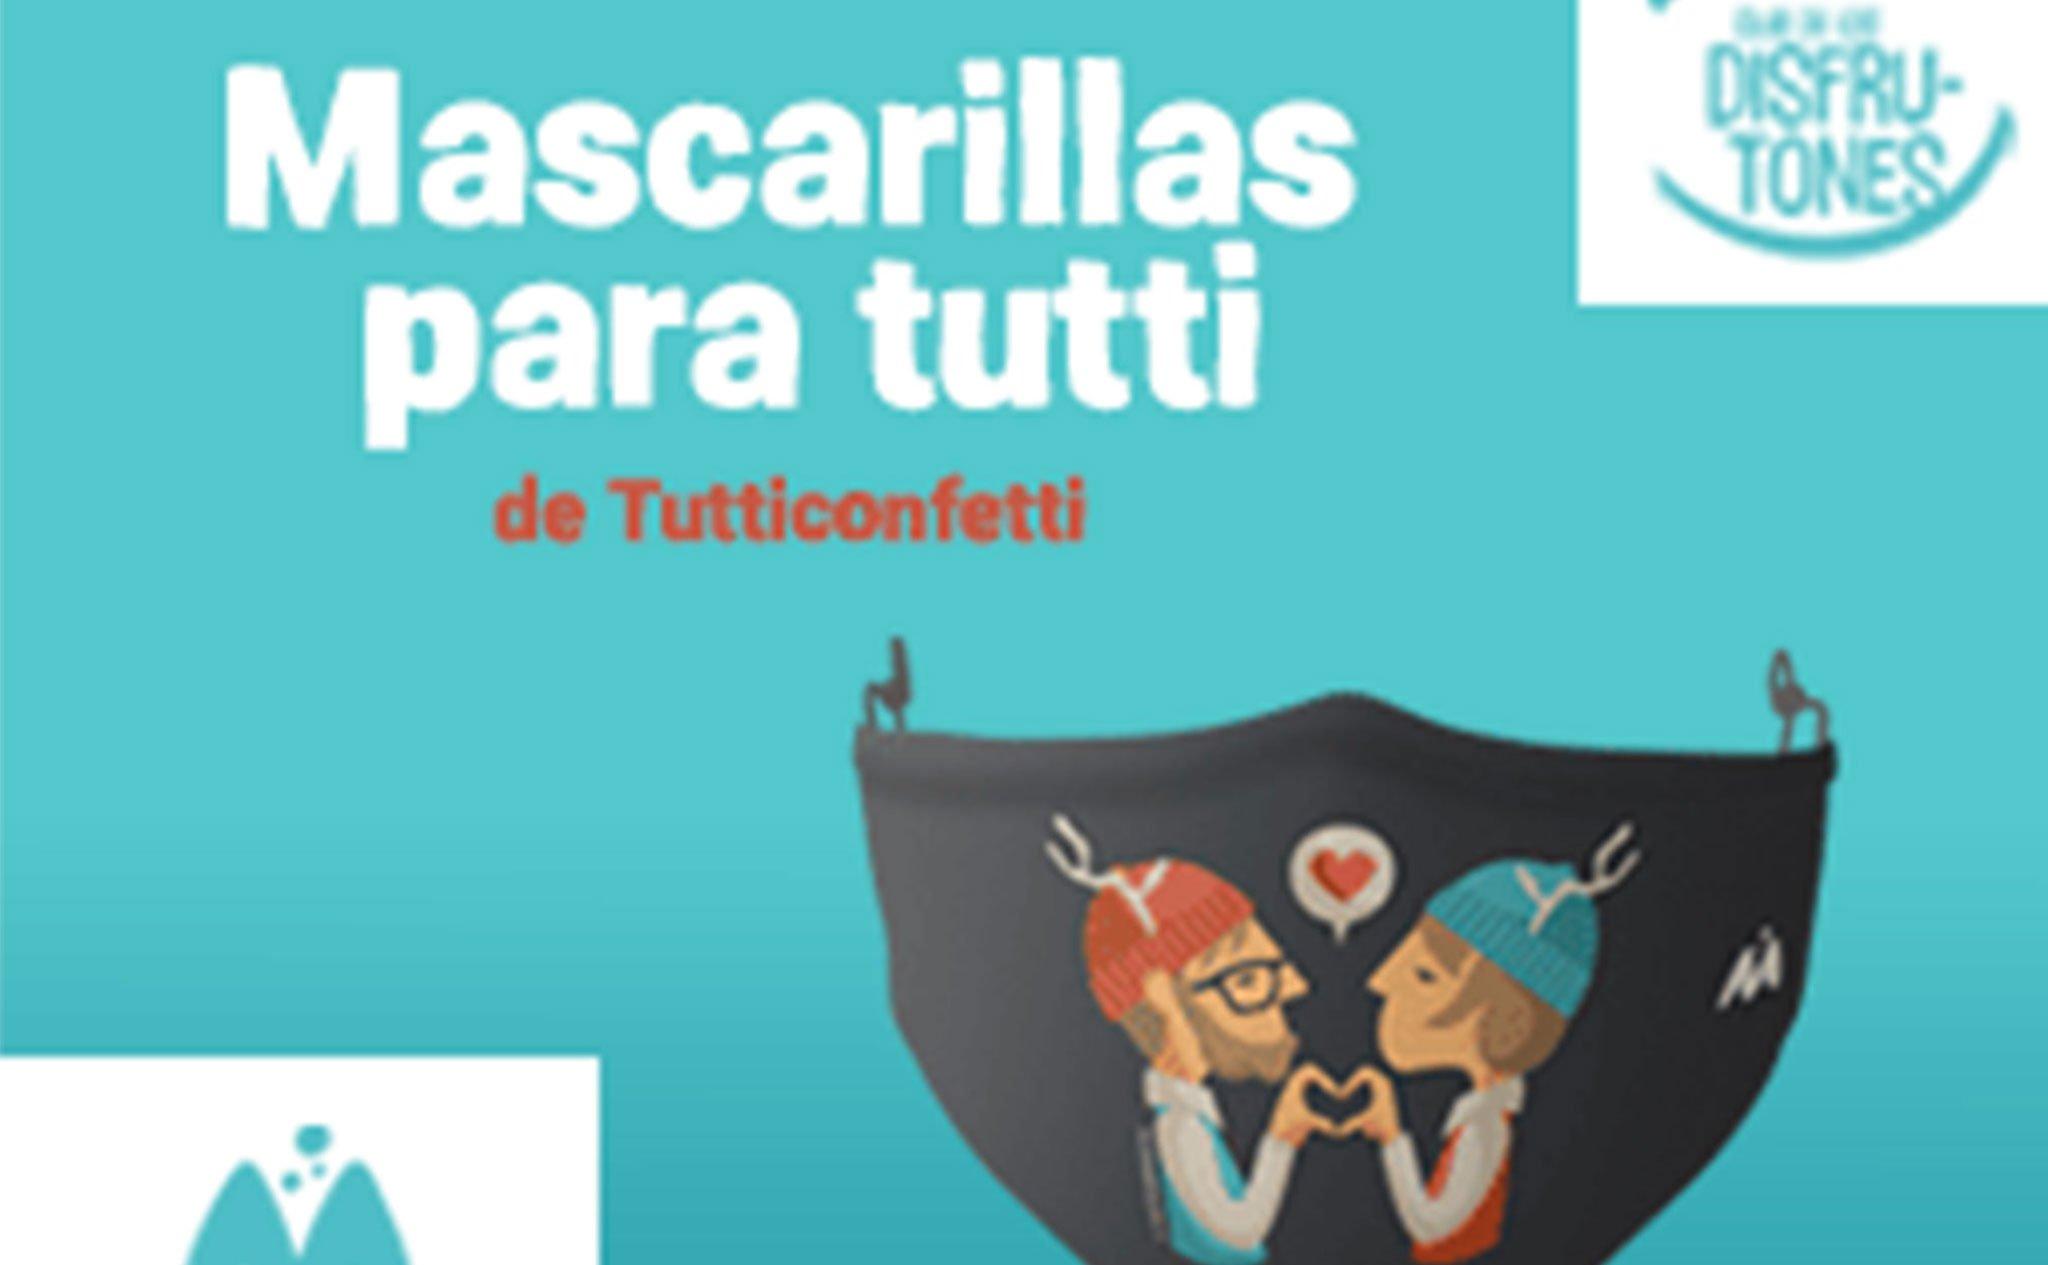 Masques conçus par l'artiste Tutticonfetti - Portal de la Marina